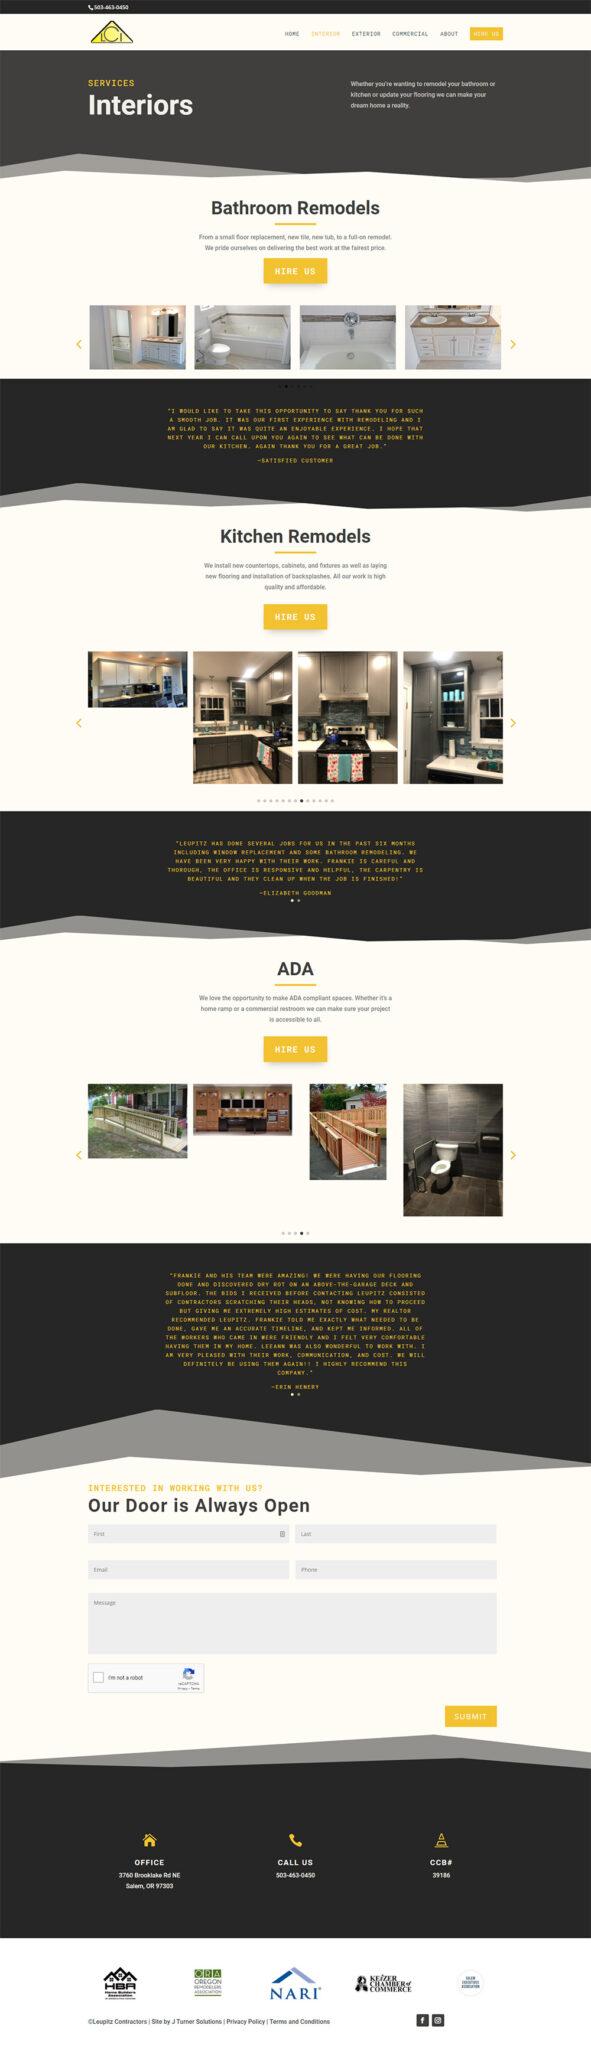 Leupitz Contractors Interiors page after redesign